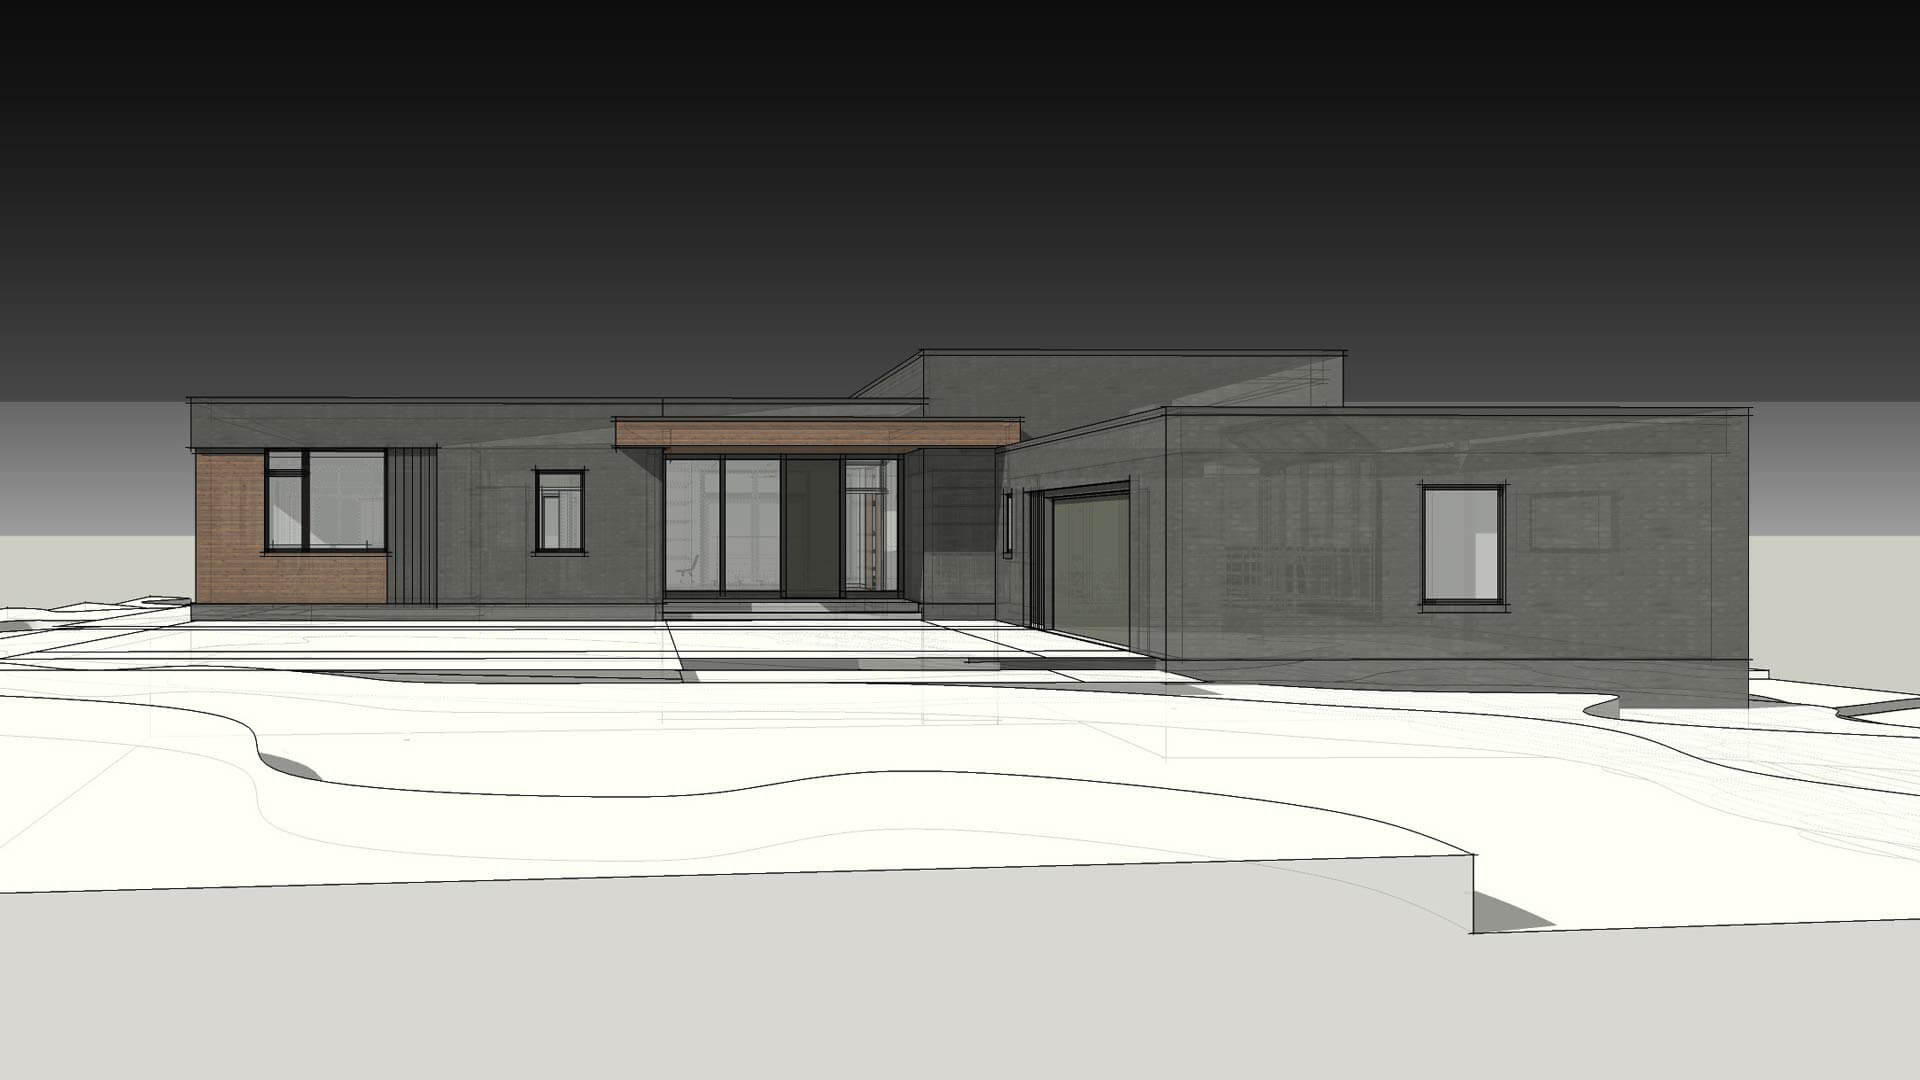 Front Exterior Elevation - Modern Brick House, Indianapolis, Windcombe Neighborhood